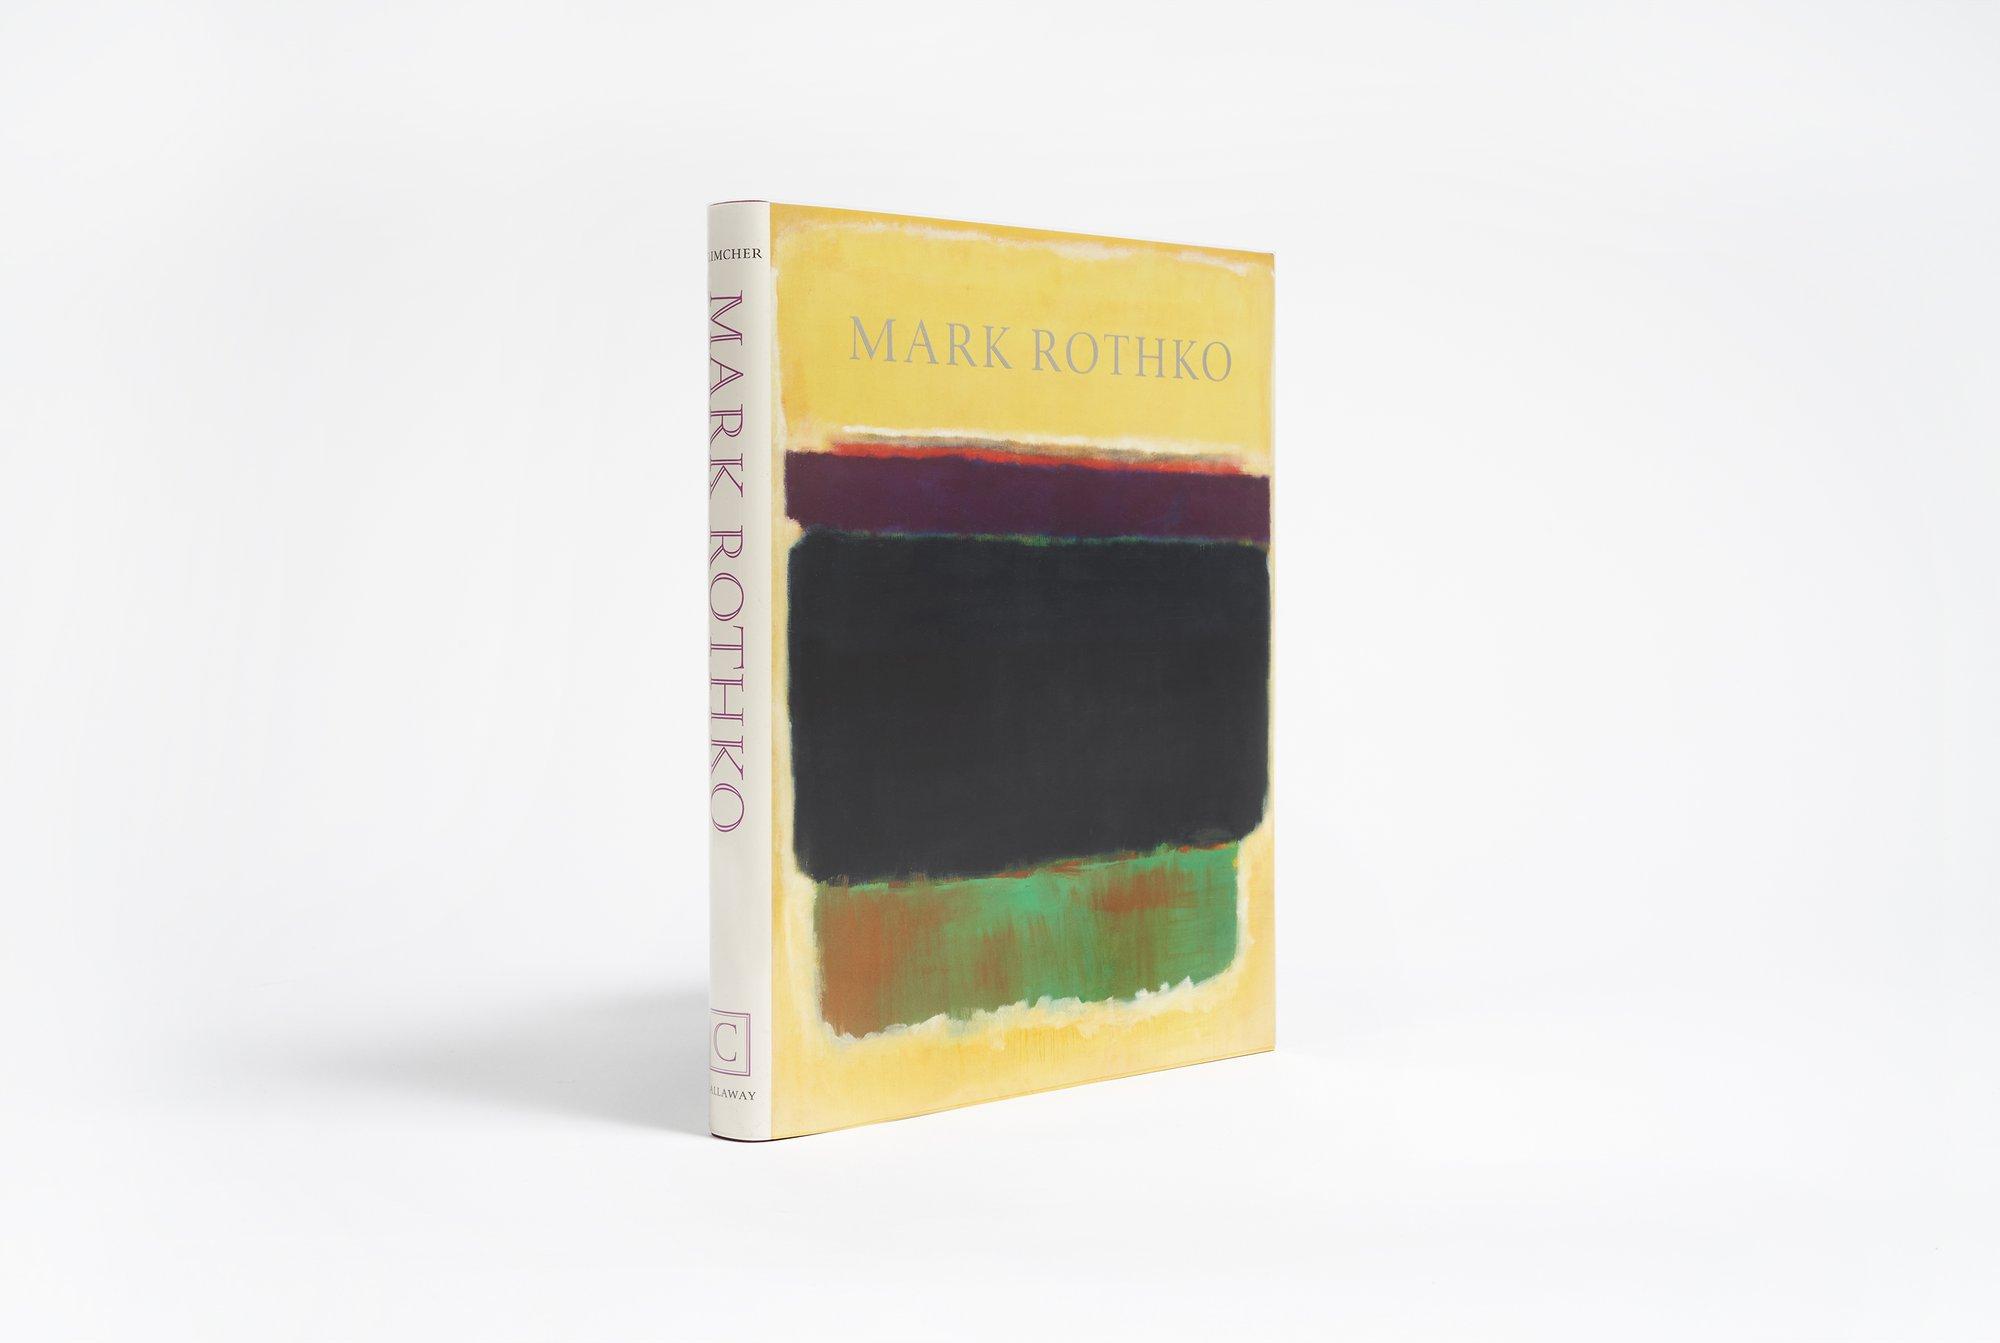 The Rothko Book